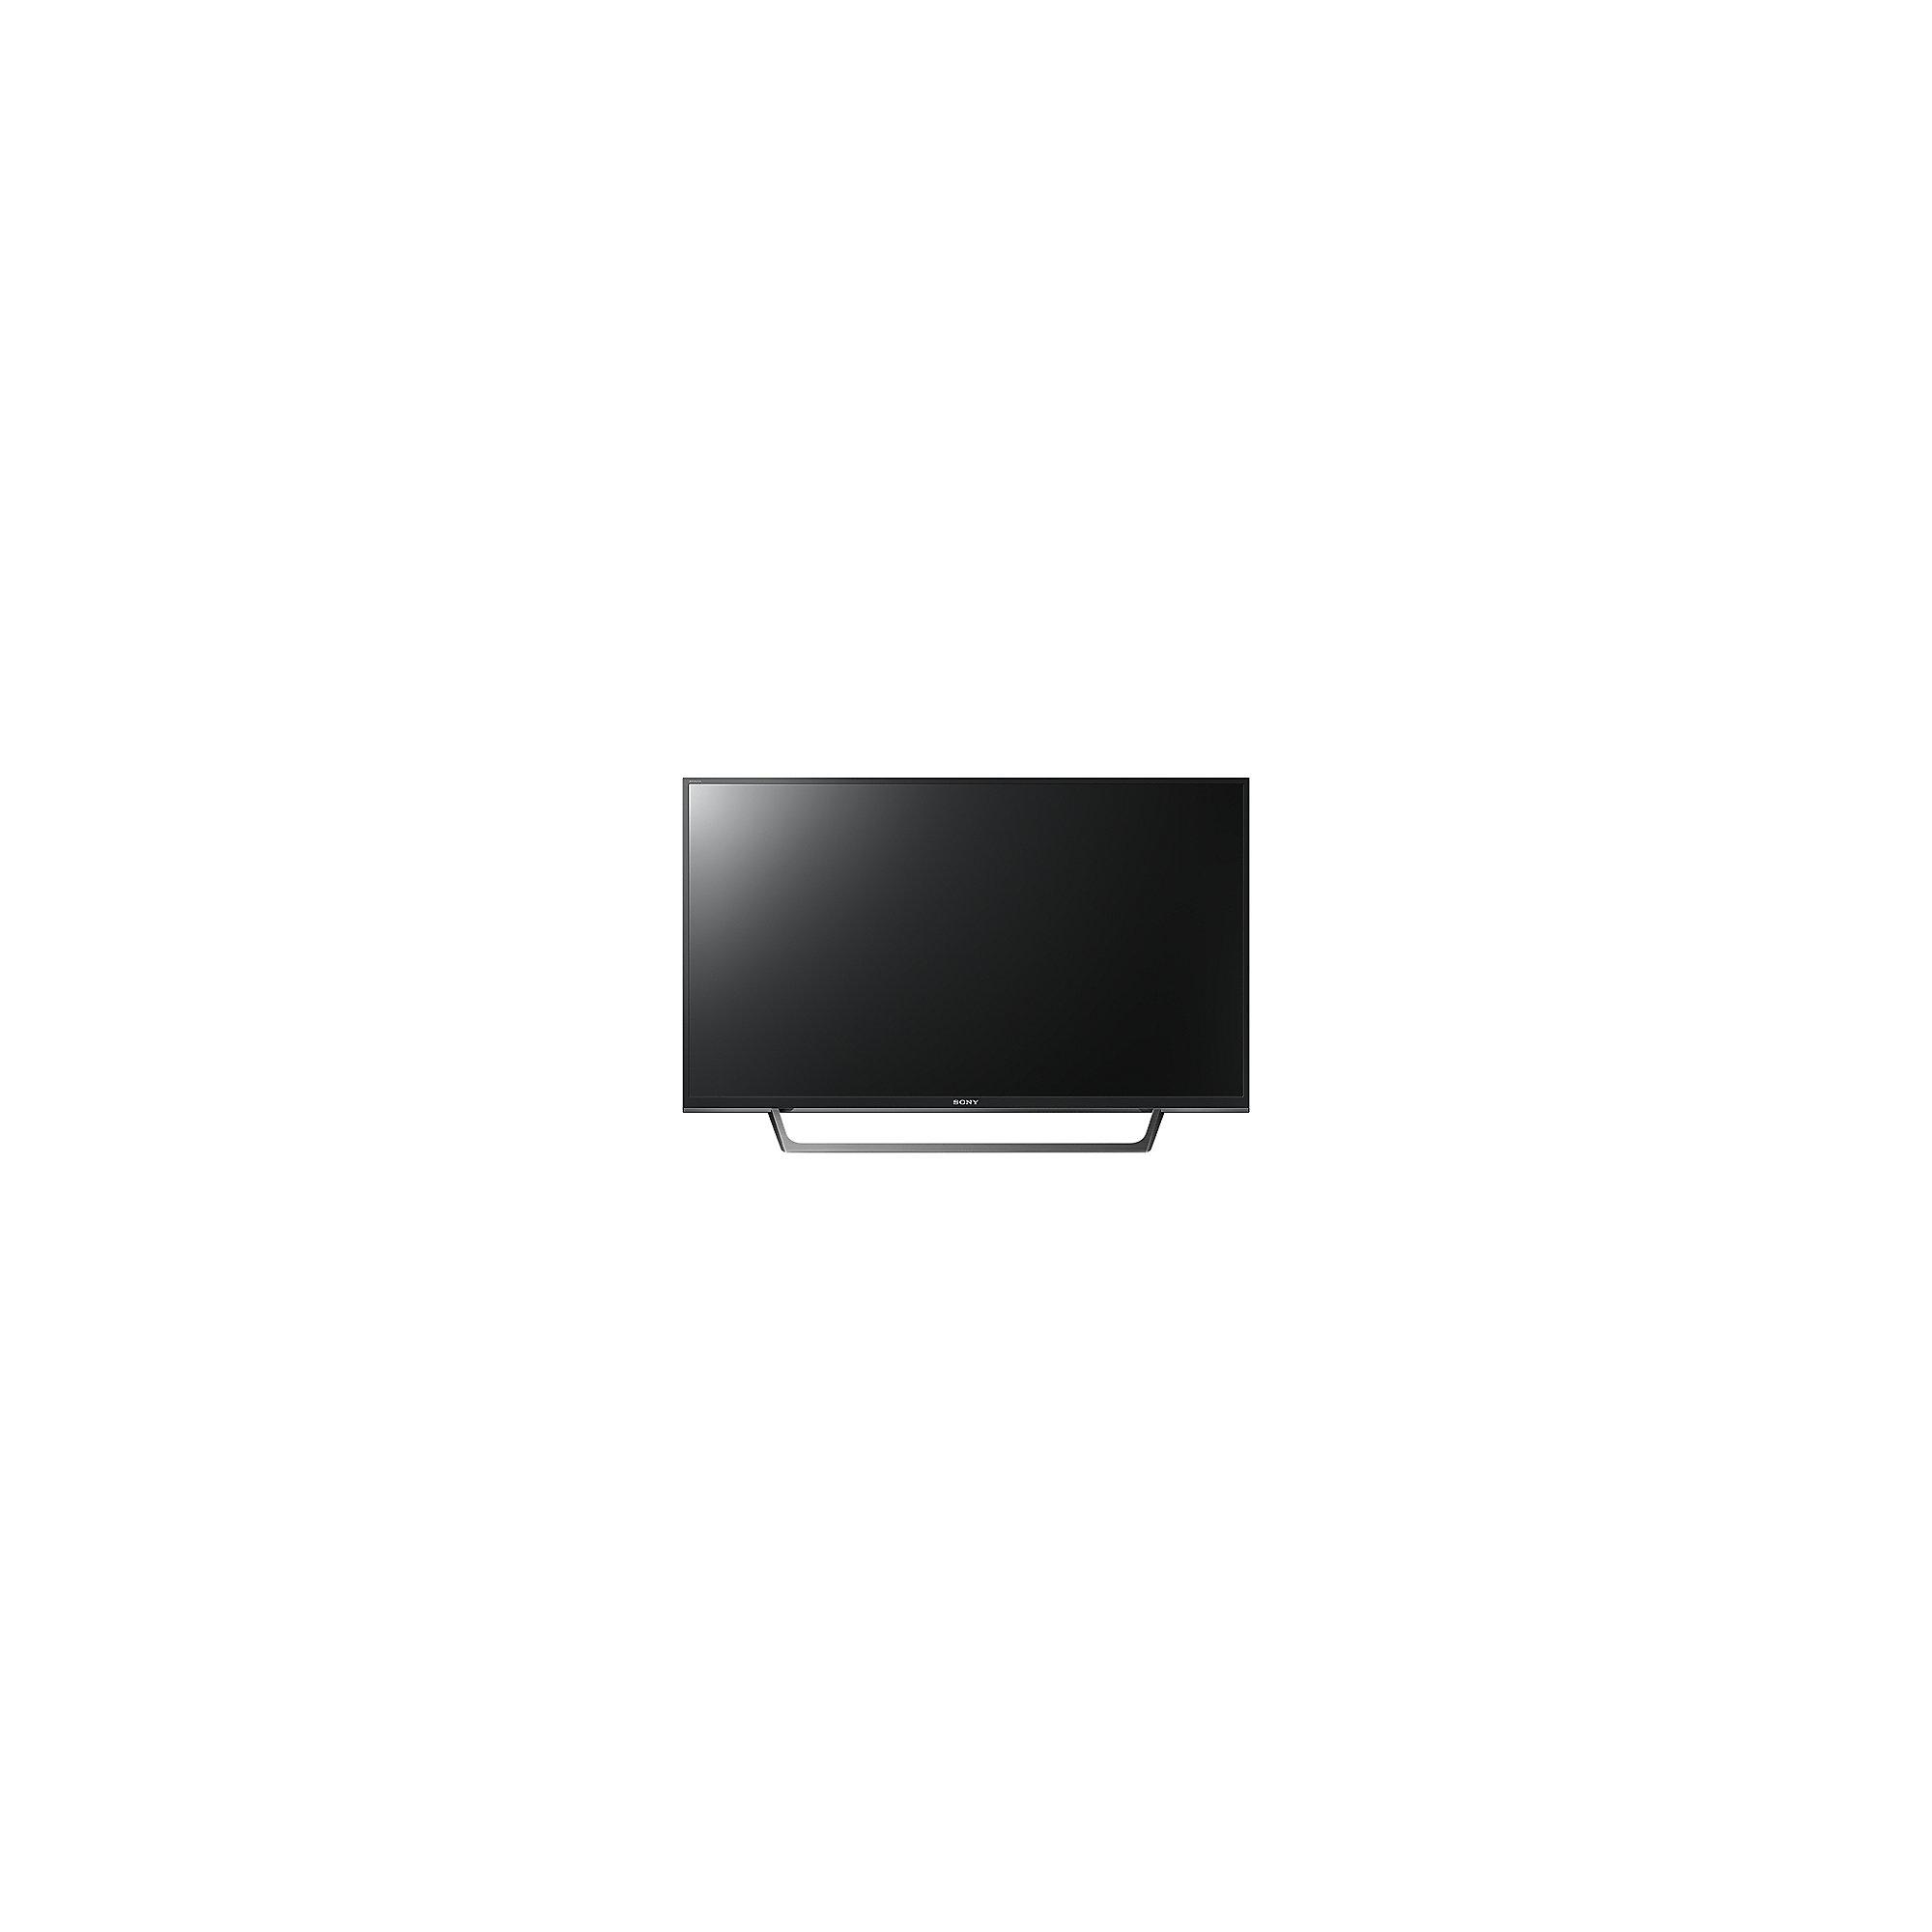 sony bravia kdl32we615 80cm 32 smart fernseher cyberport. Black Bedroom Furniture Sets. Home Design Ideas